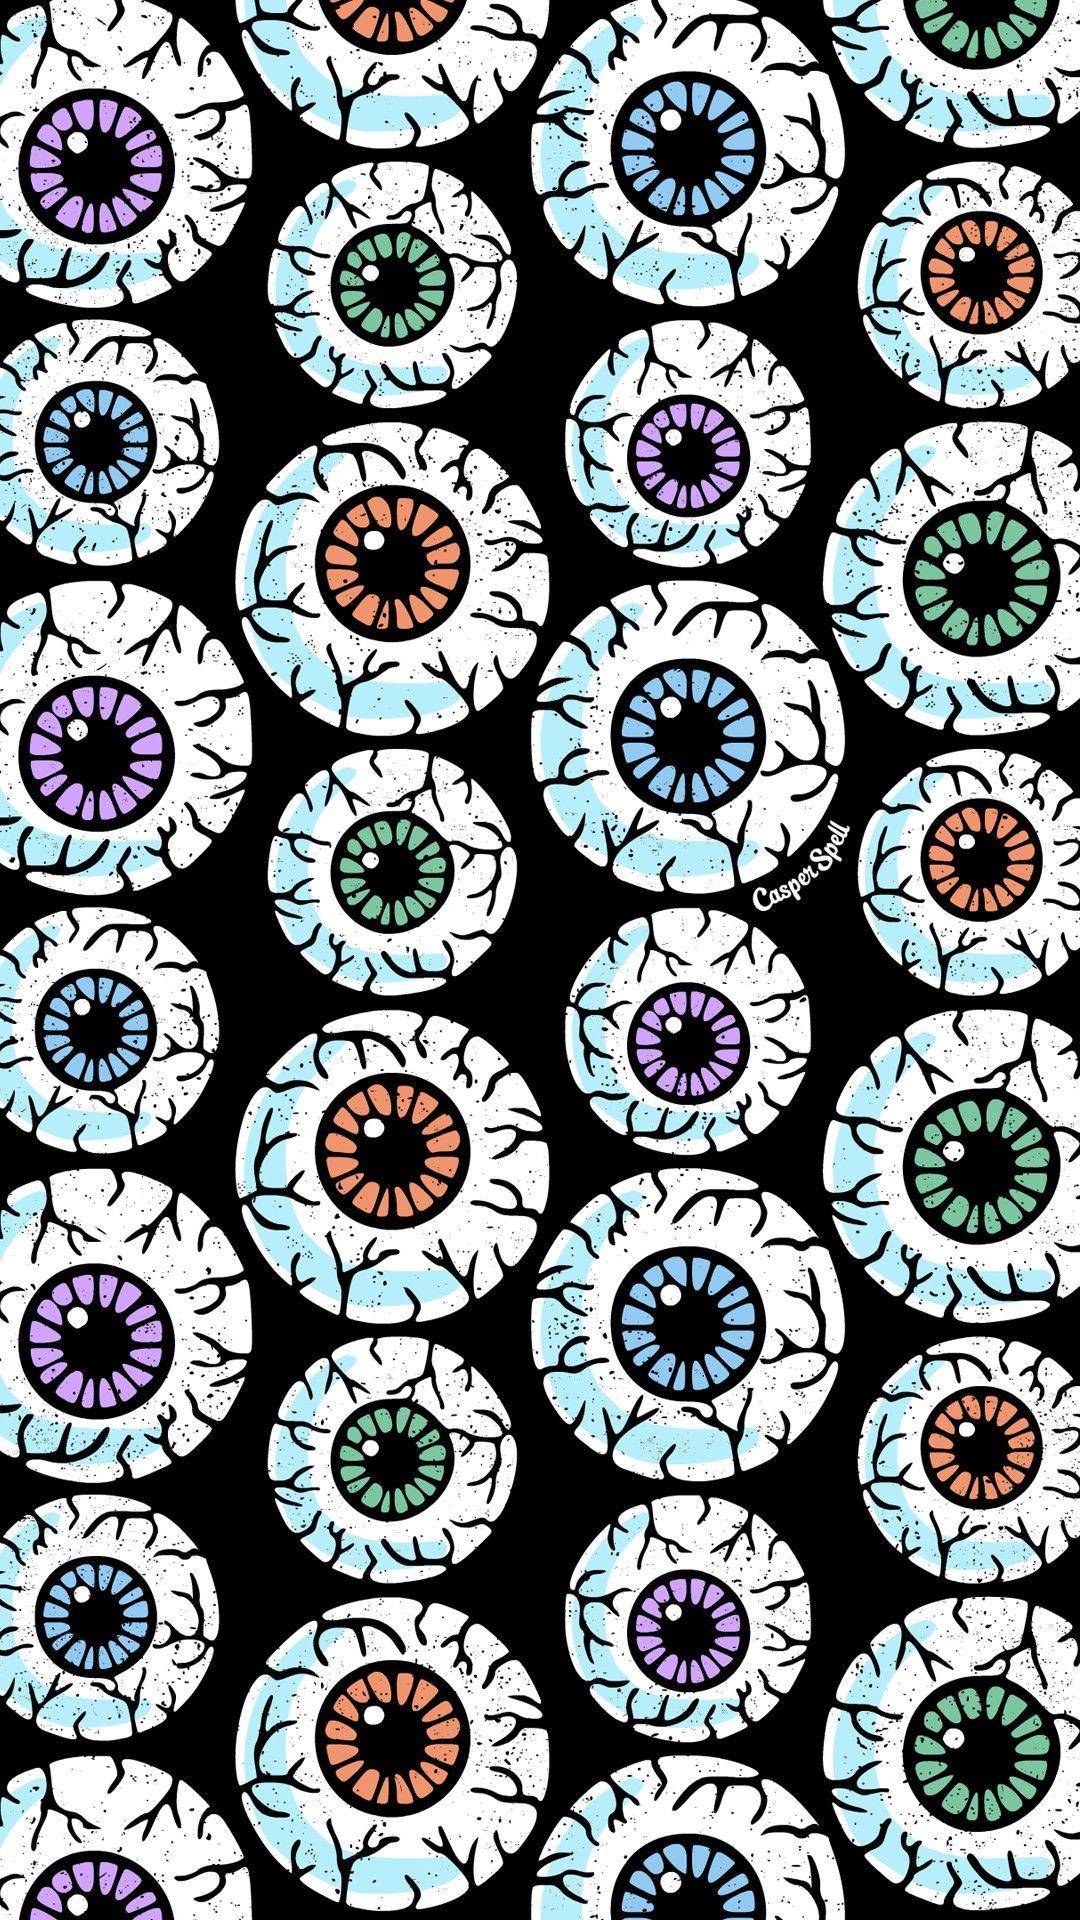 Eyes eyeballs pattern patterns repeat wallpaper